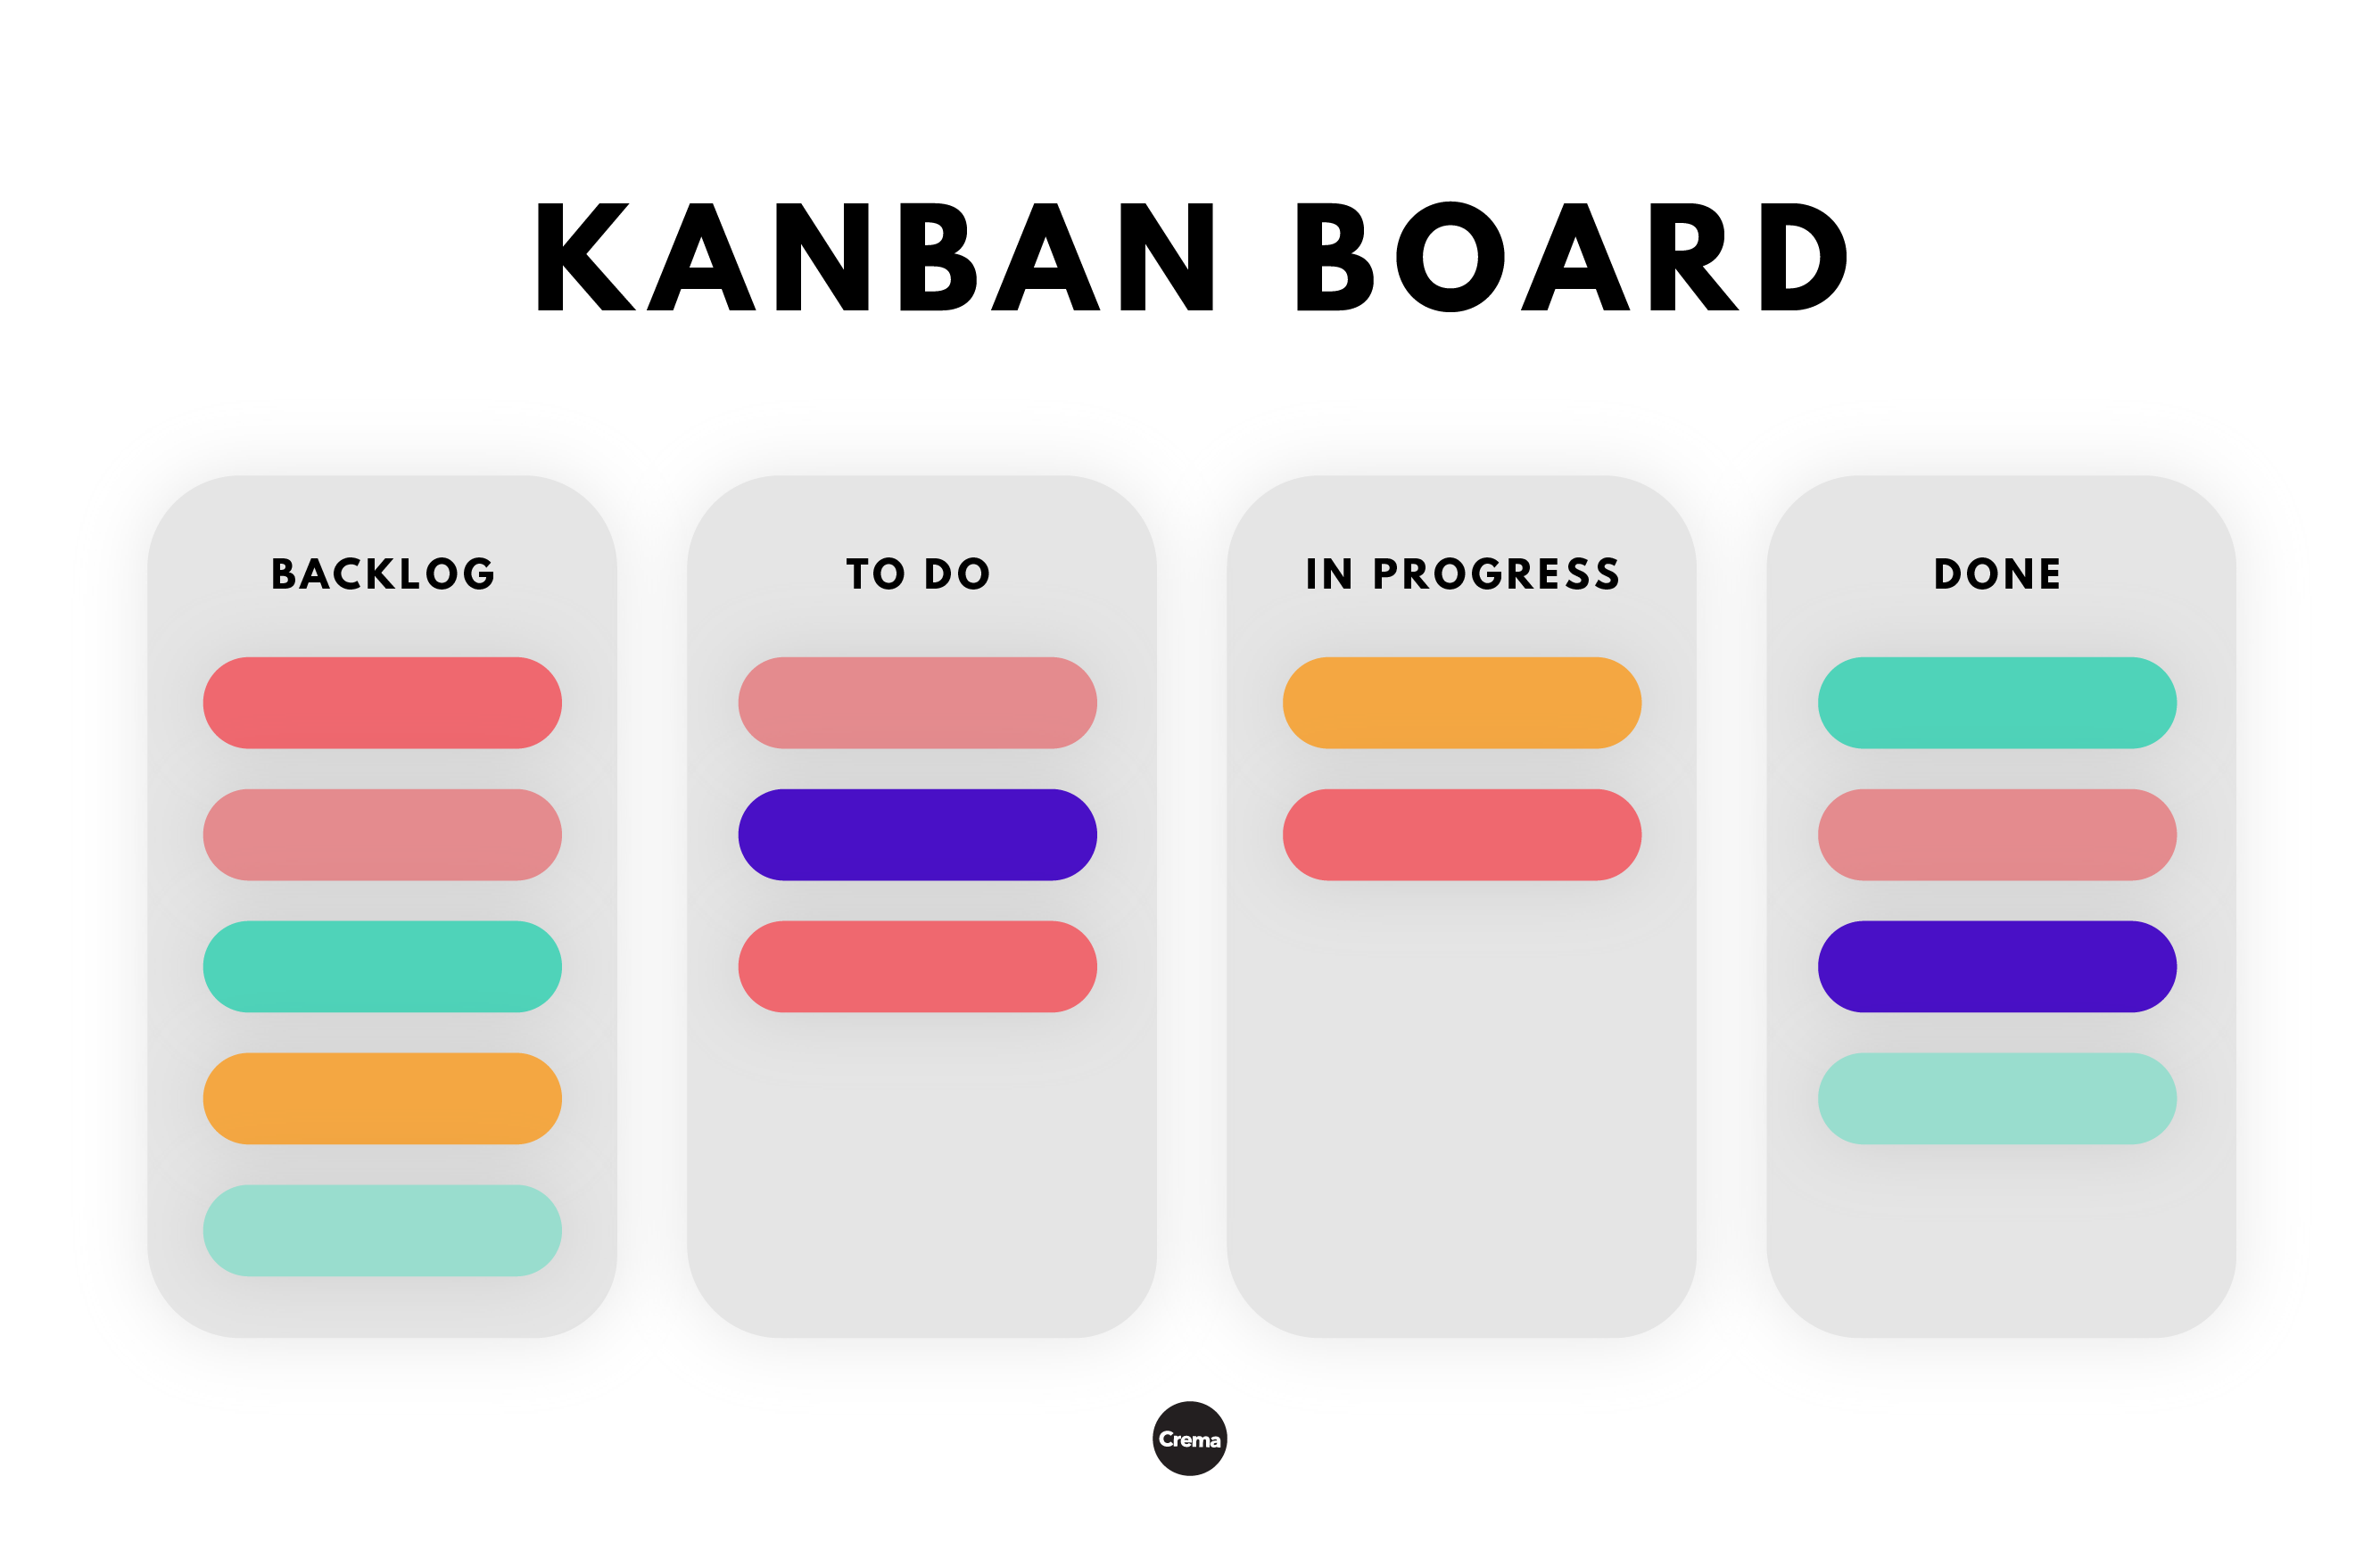 Kanban board graphic